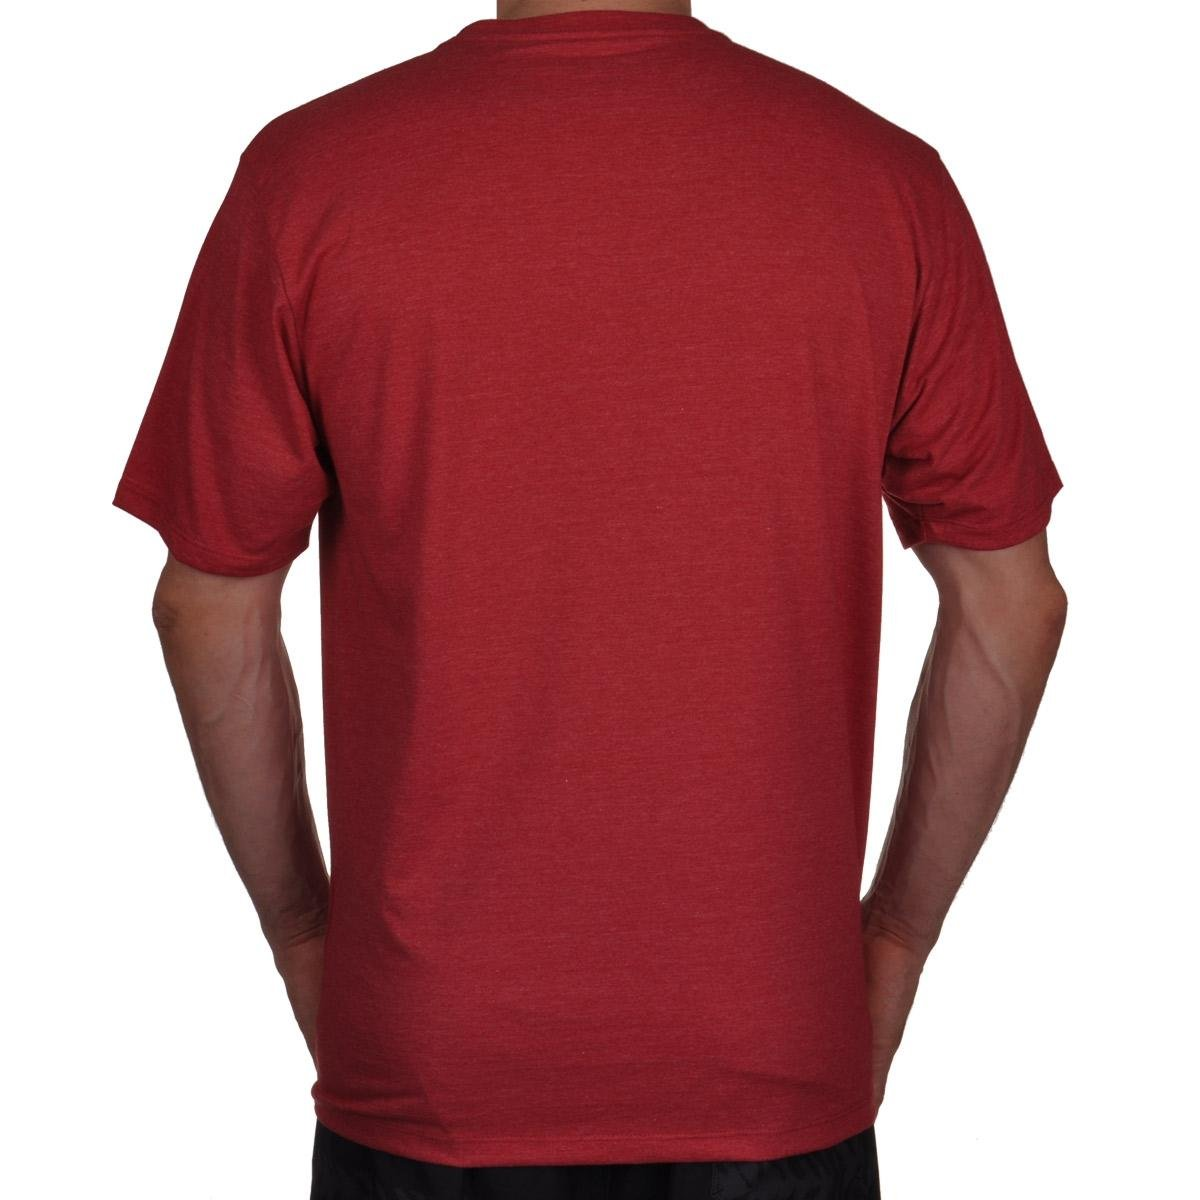 Silk Vermelho Camiseta Masculino Hurley Silk amp;O O Vermelho Camiseta Masculino Hurley O amp;O q7d4C